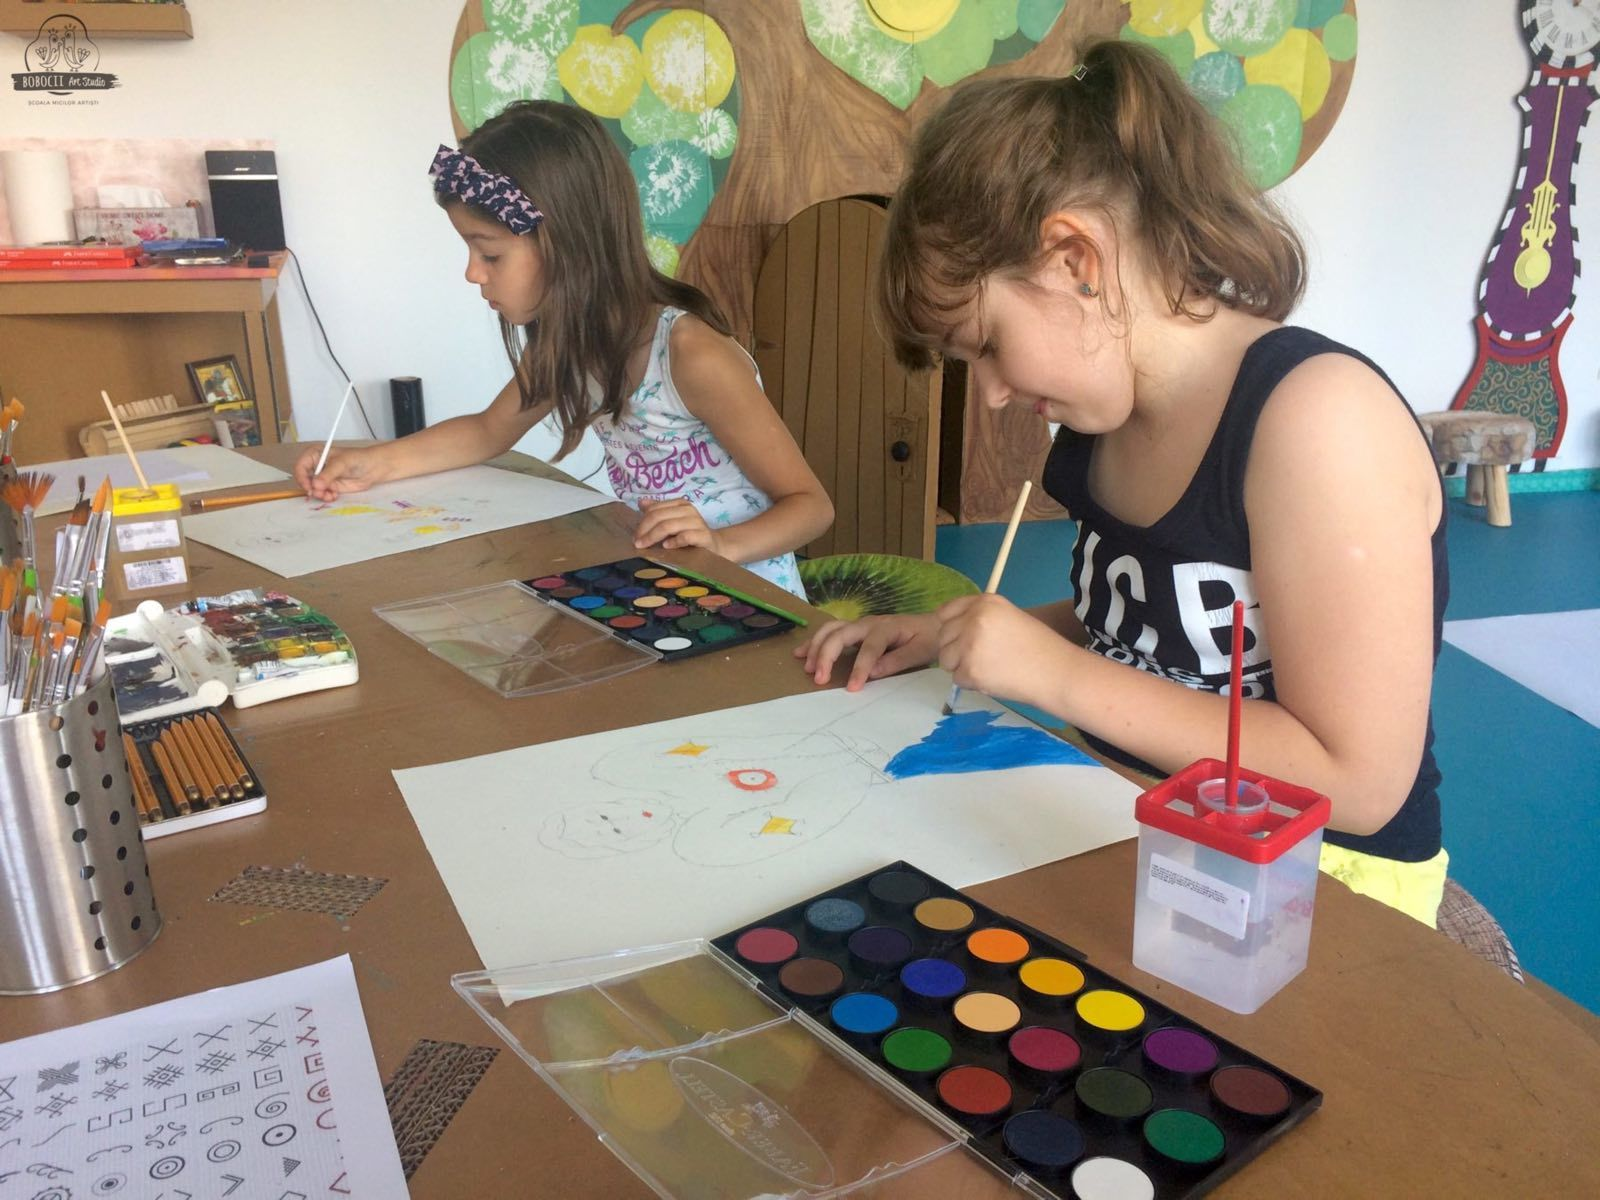 Matisse, Van Gogh & Gauguin inspiration